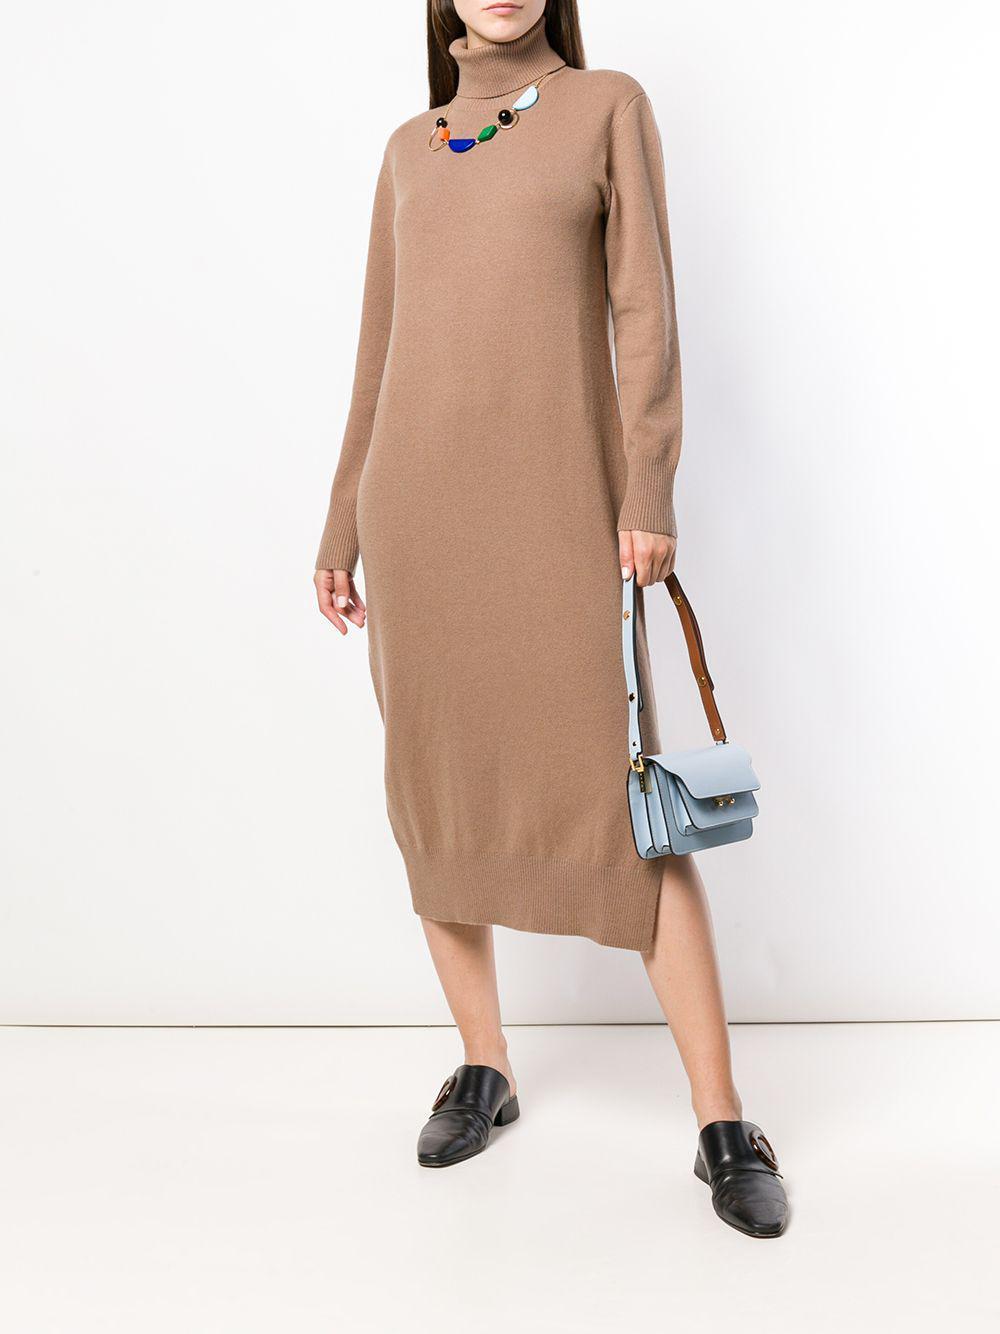 Joseph Brown Roll Neck Sweater Dress Lyst View Fullscreen